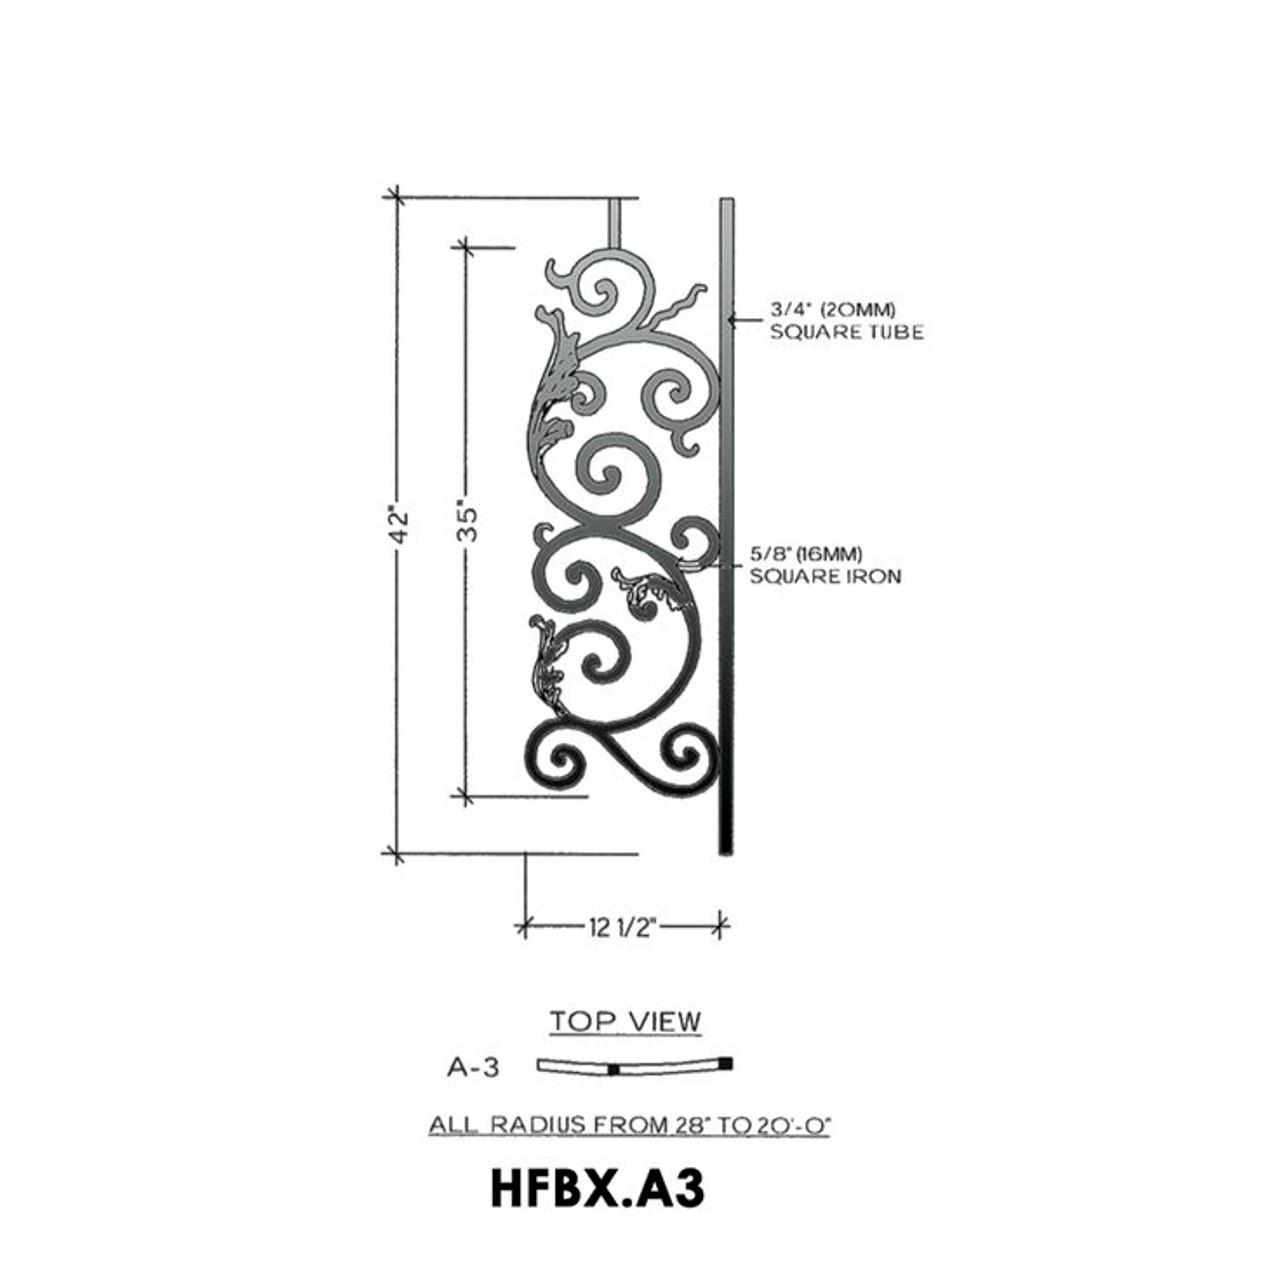 HFBX.A3 Bordeaux Radius Balcony Iron Panel